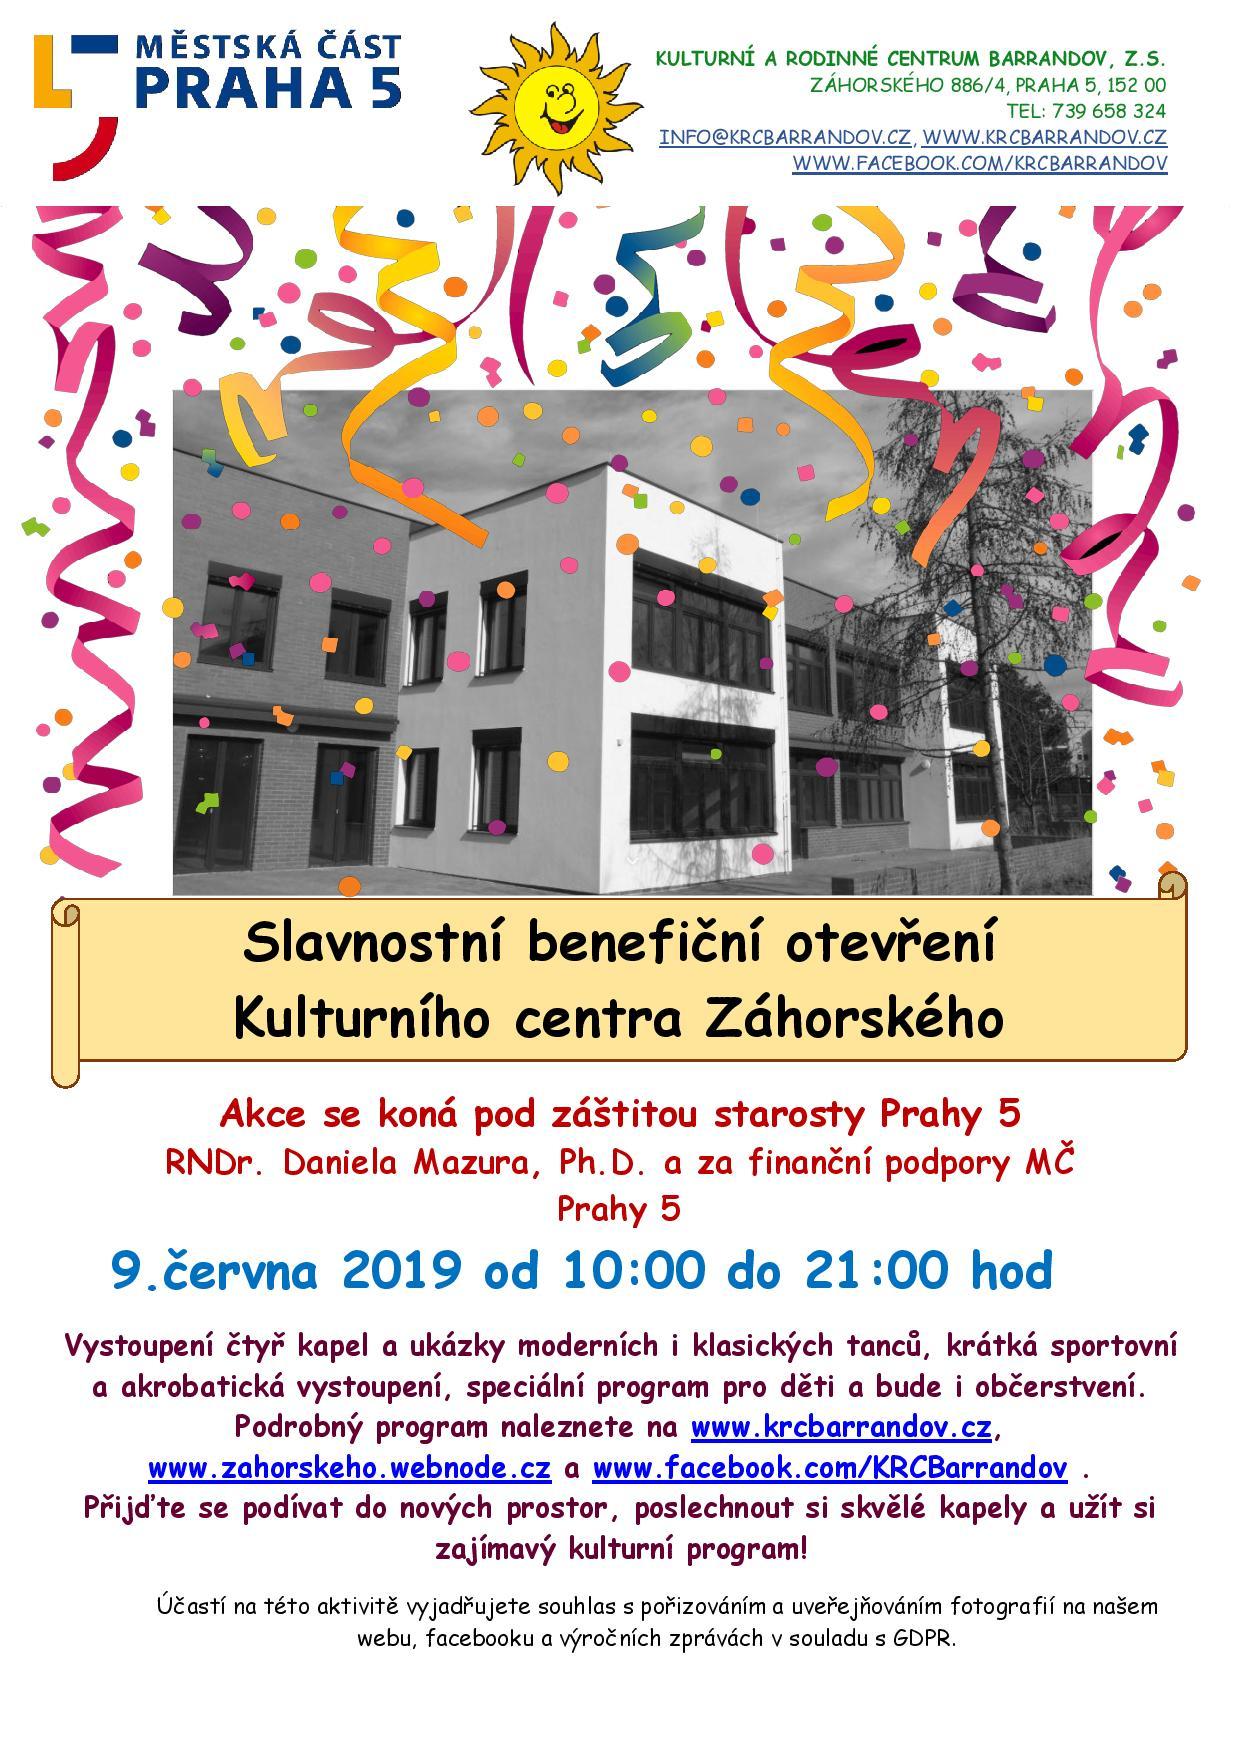 kulturni-centrum-zahorskeho-se-otvira-v-nedeli